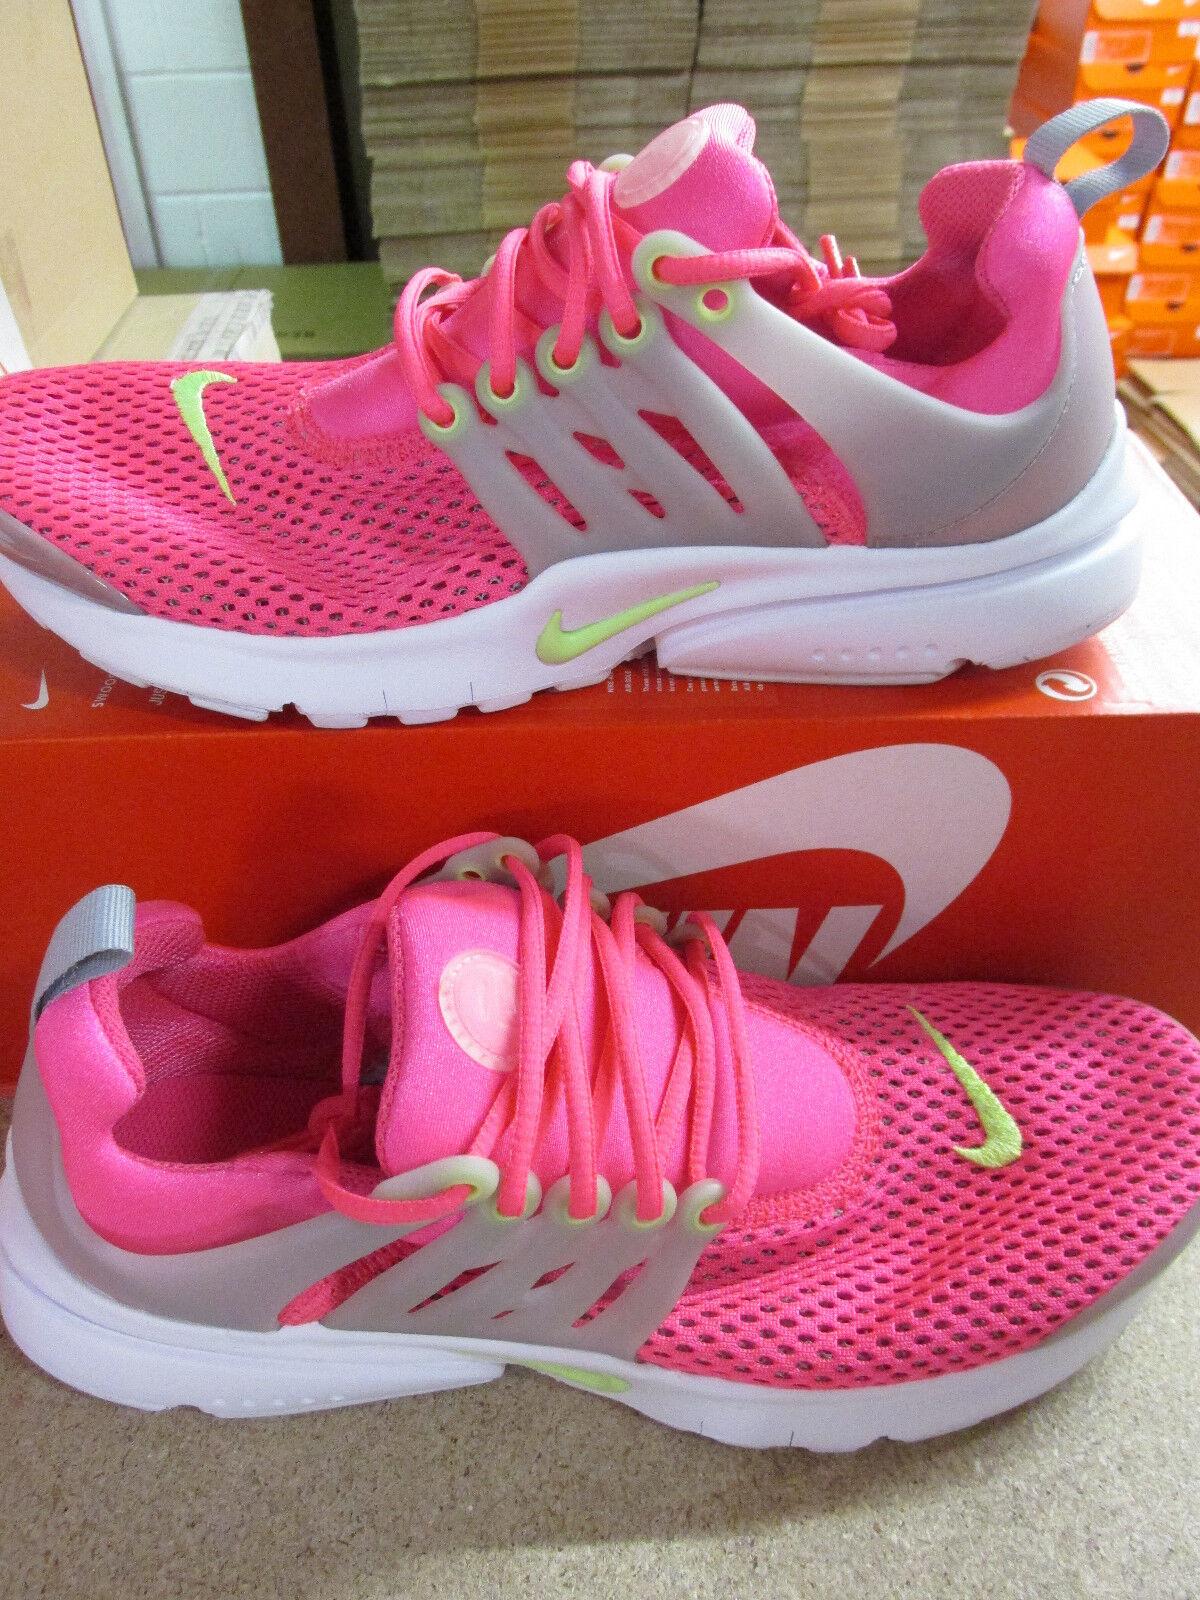 Nike presto BR (GS) youth running